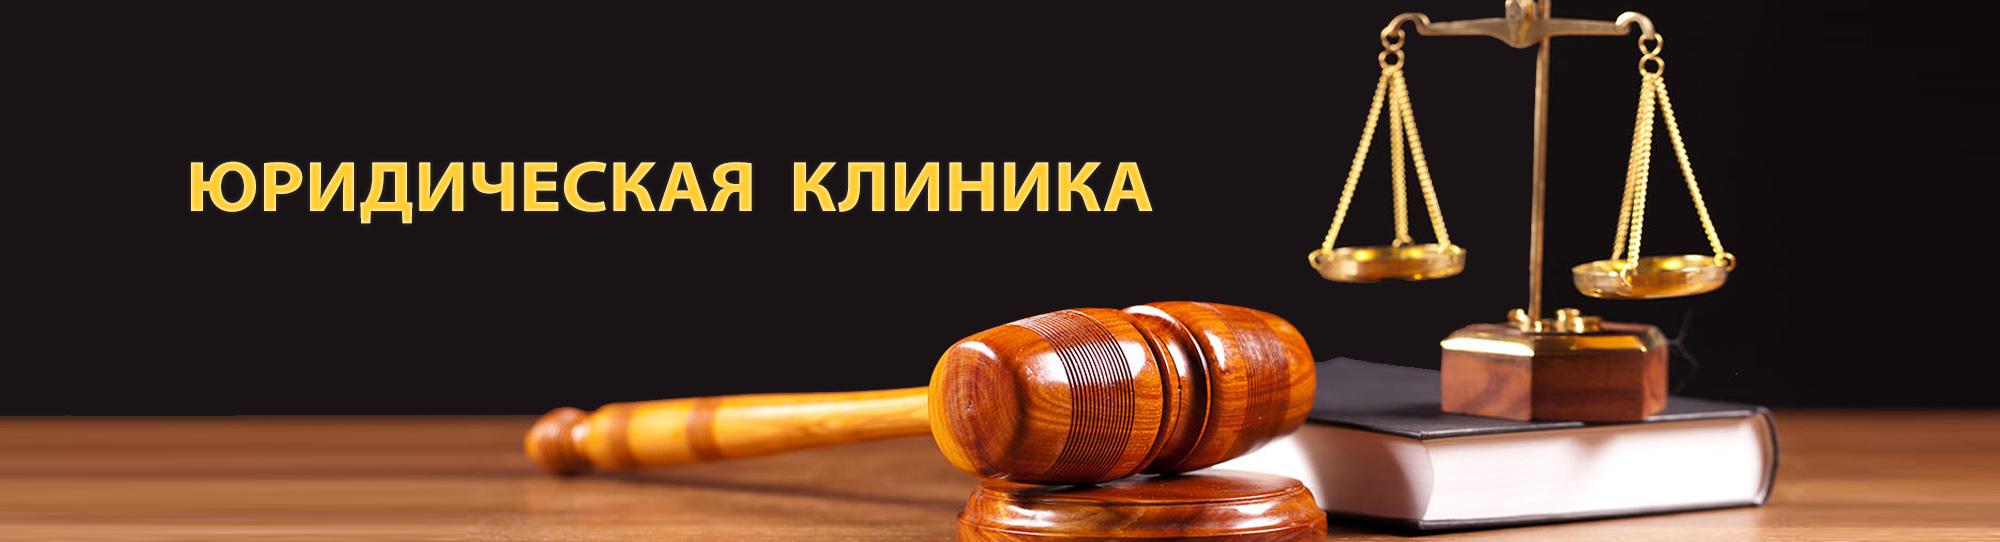 banner-yurklinika